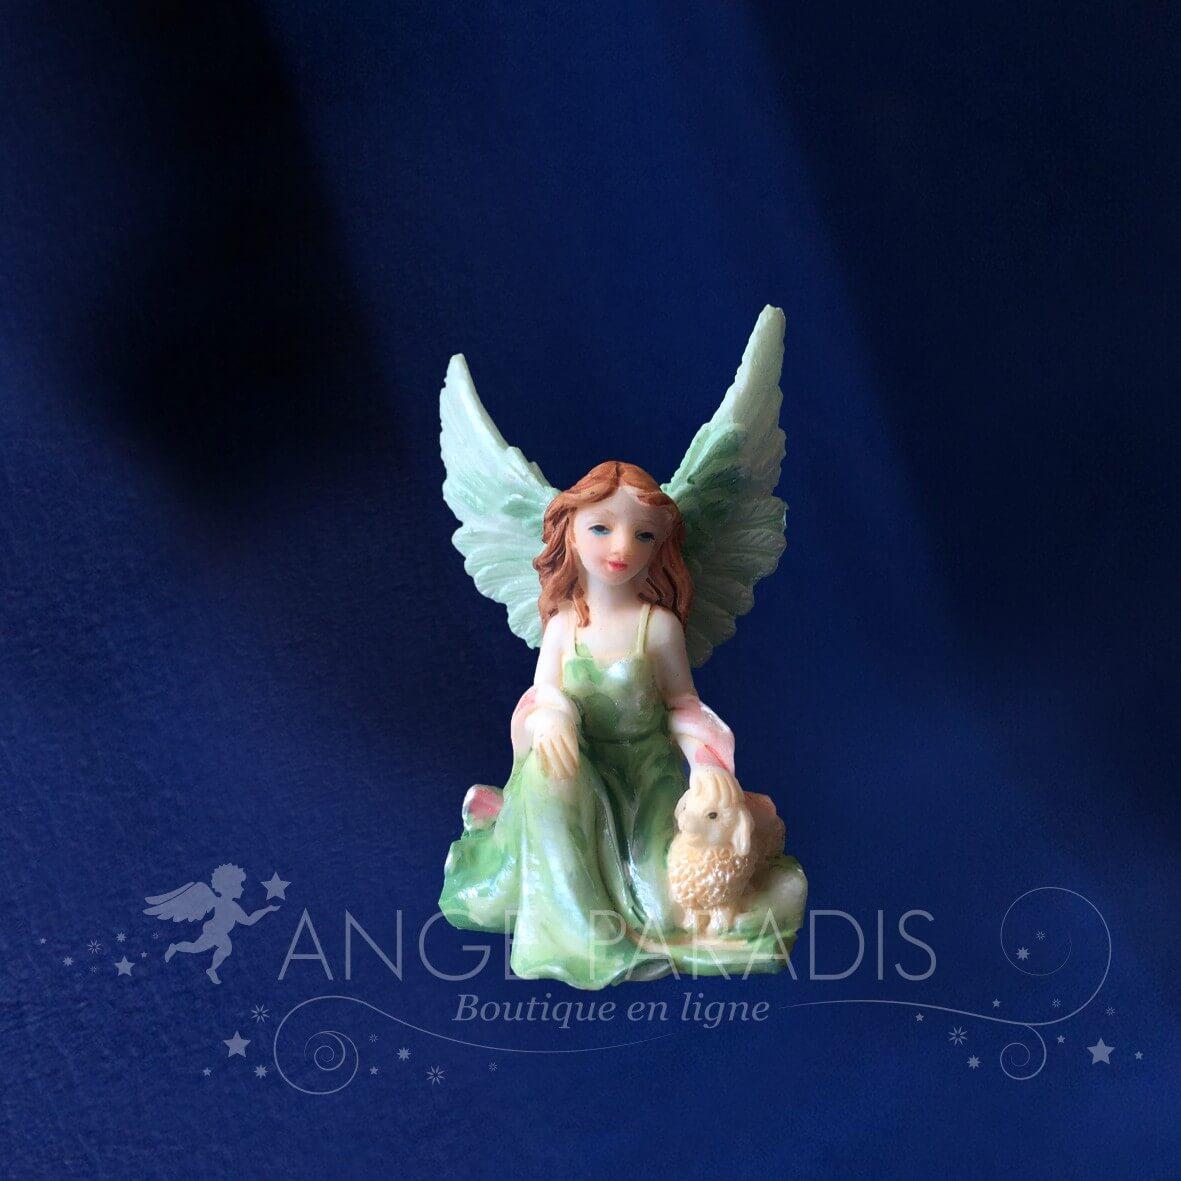 ANGELOT DE L'INNOCENCE